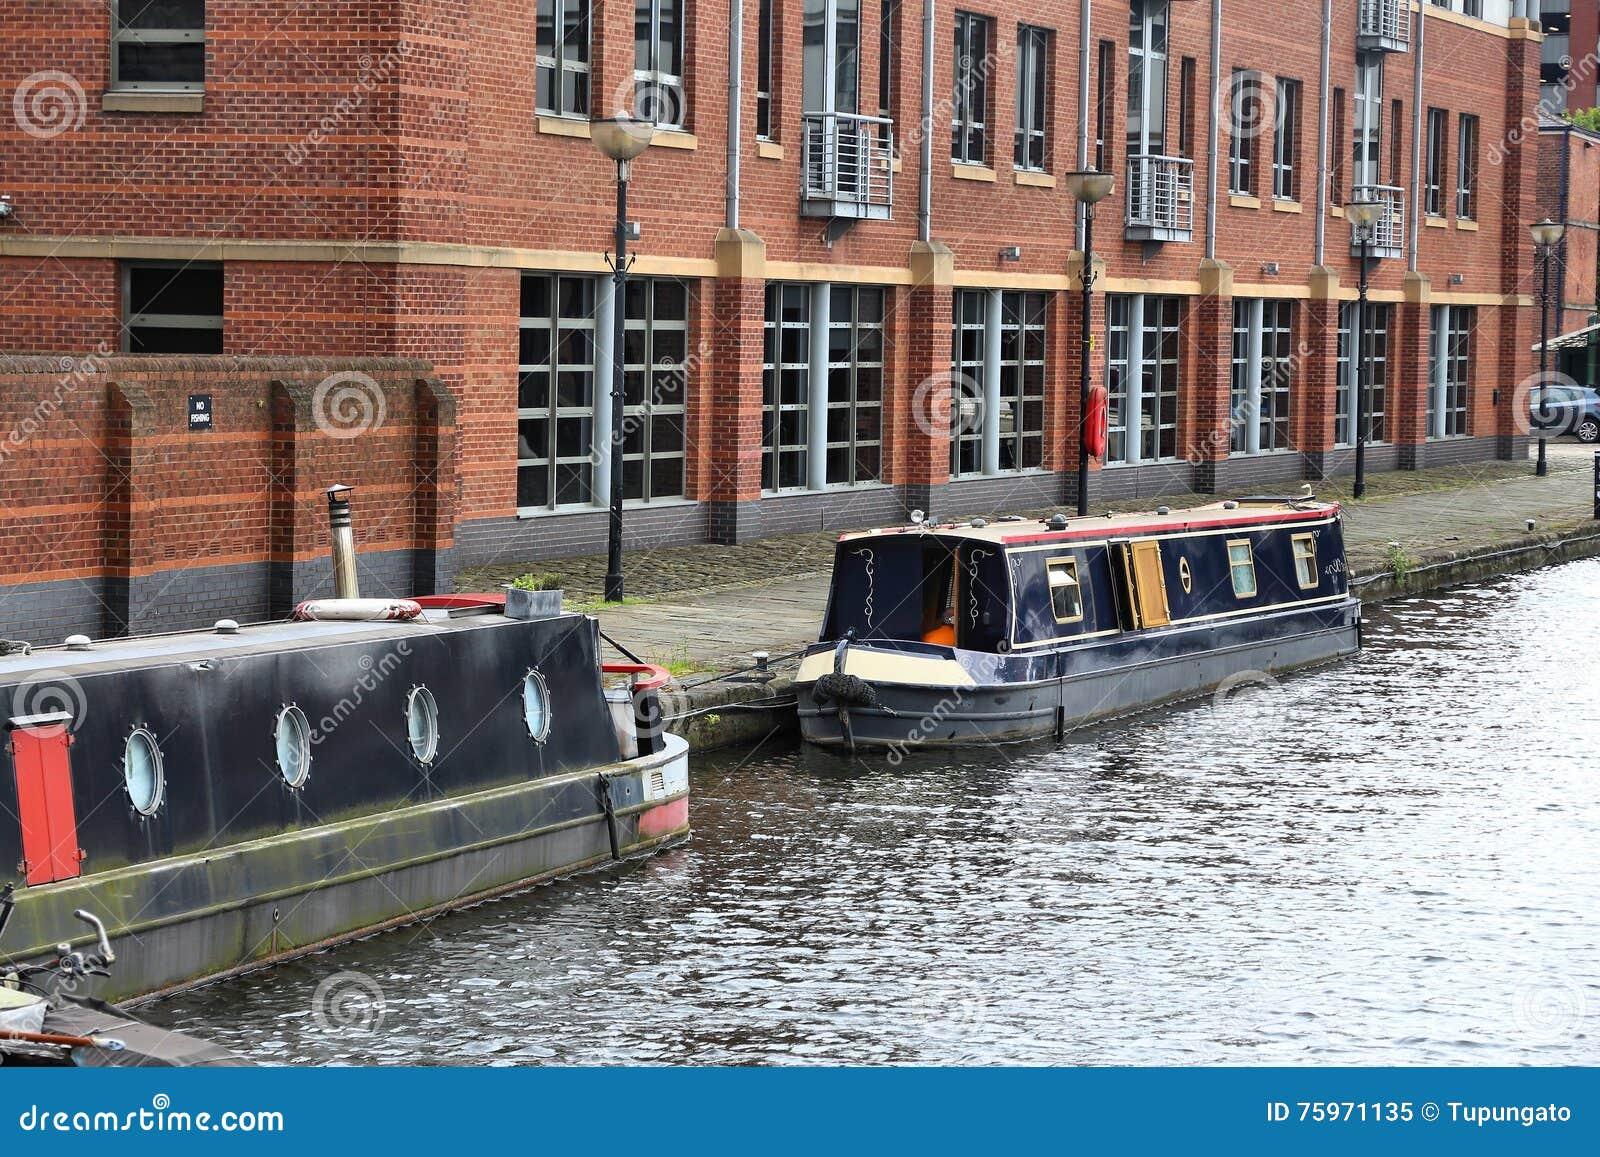 Sheffield Canal